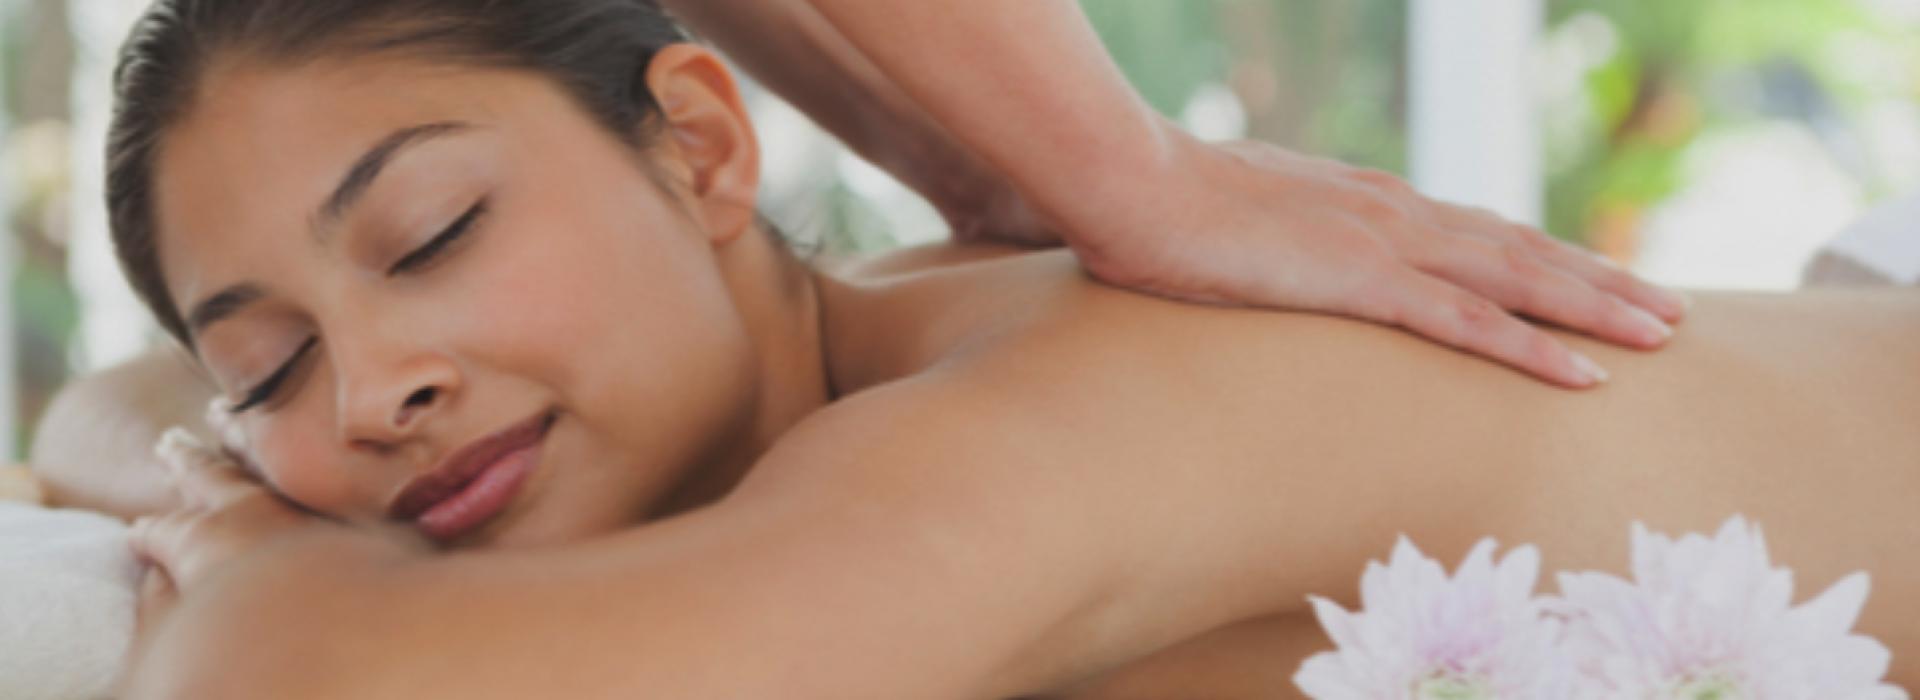 Serene Wellness Spa | Friendswood TX 77546 (281)464-8322 Massages & Spa Treatments